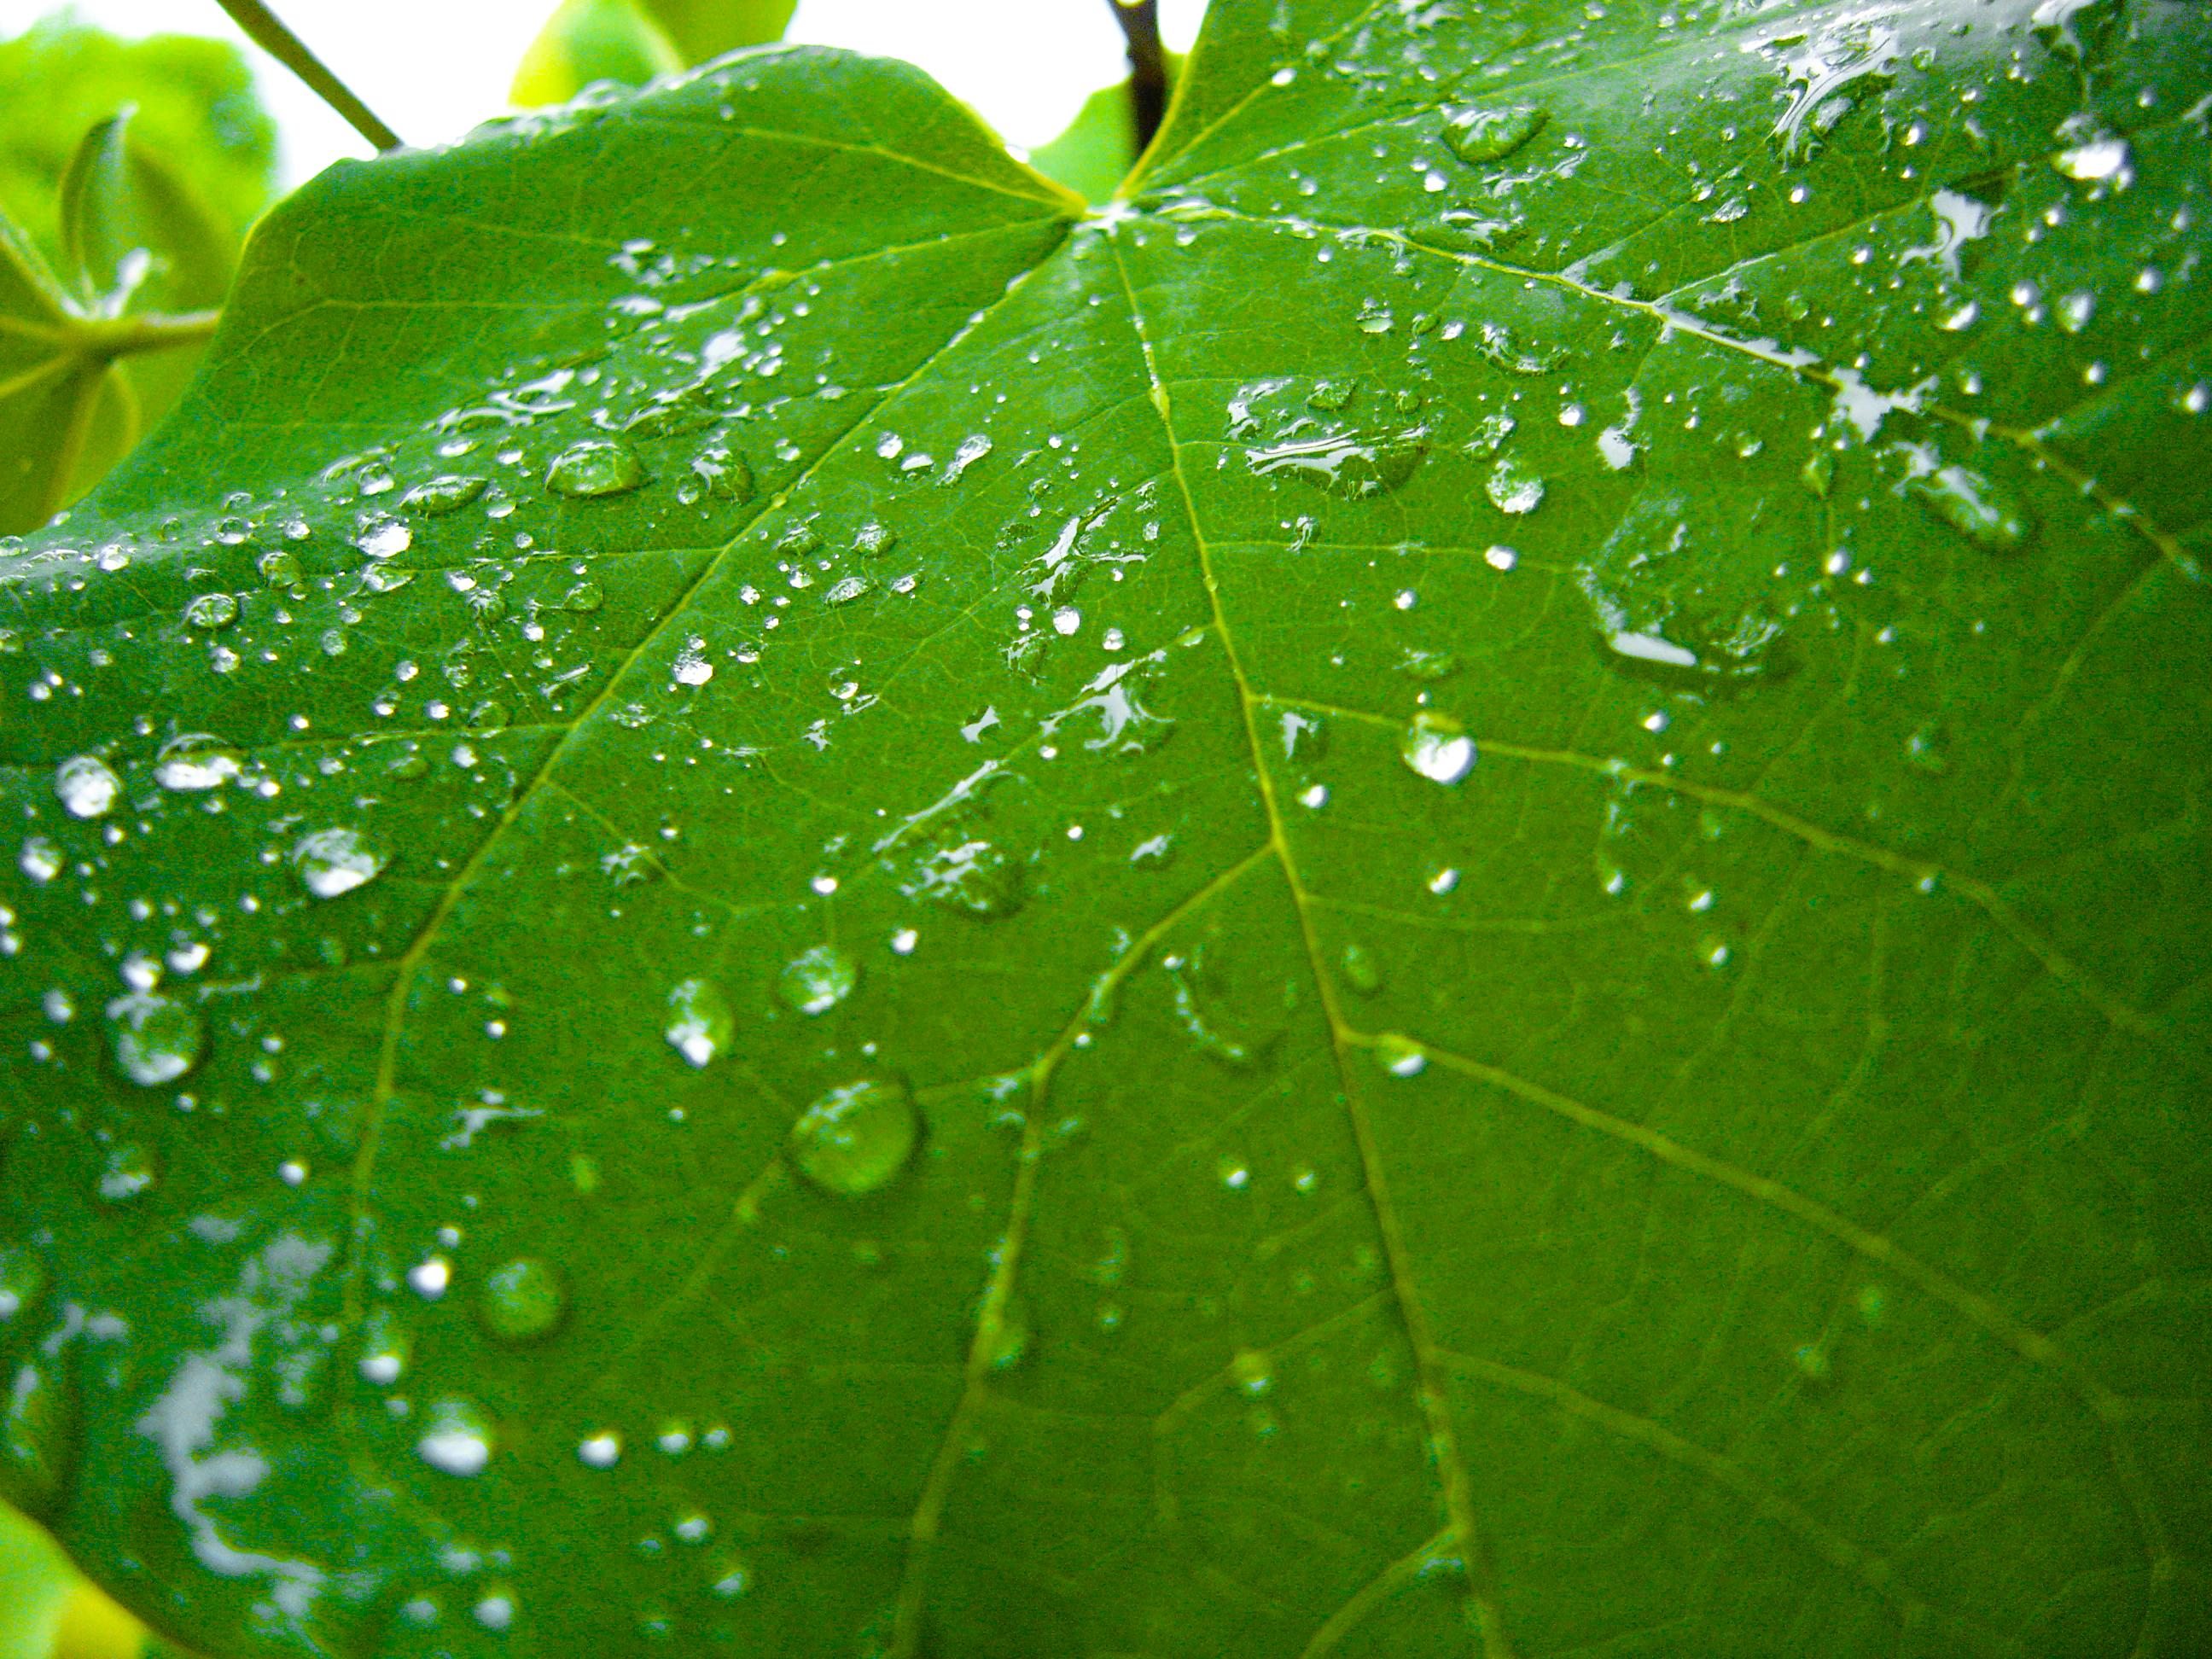 File:Rain on a grapevine leaf.jpg - Wikimedia Commons